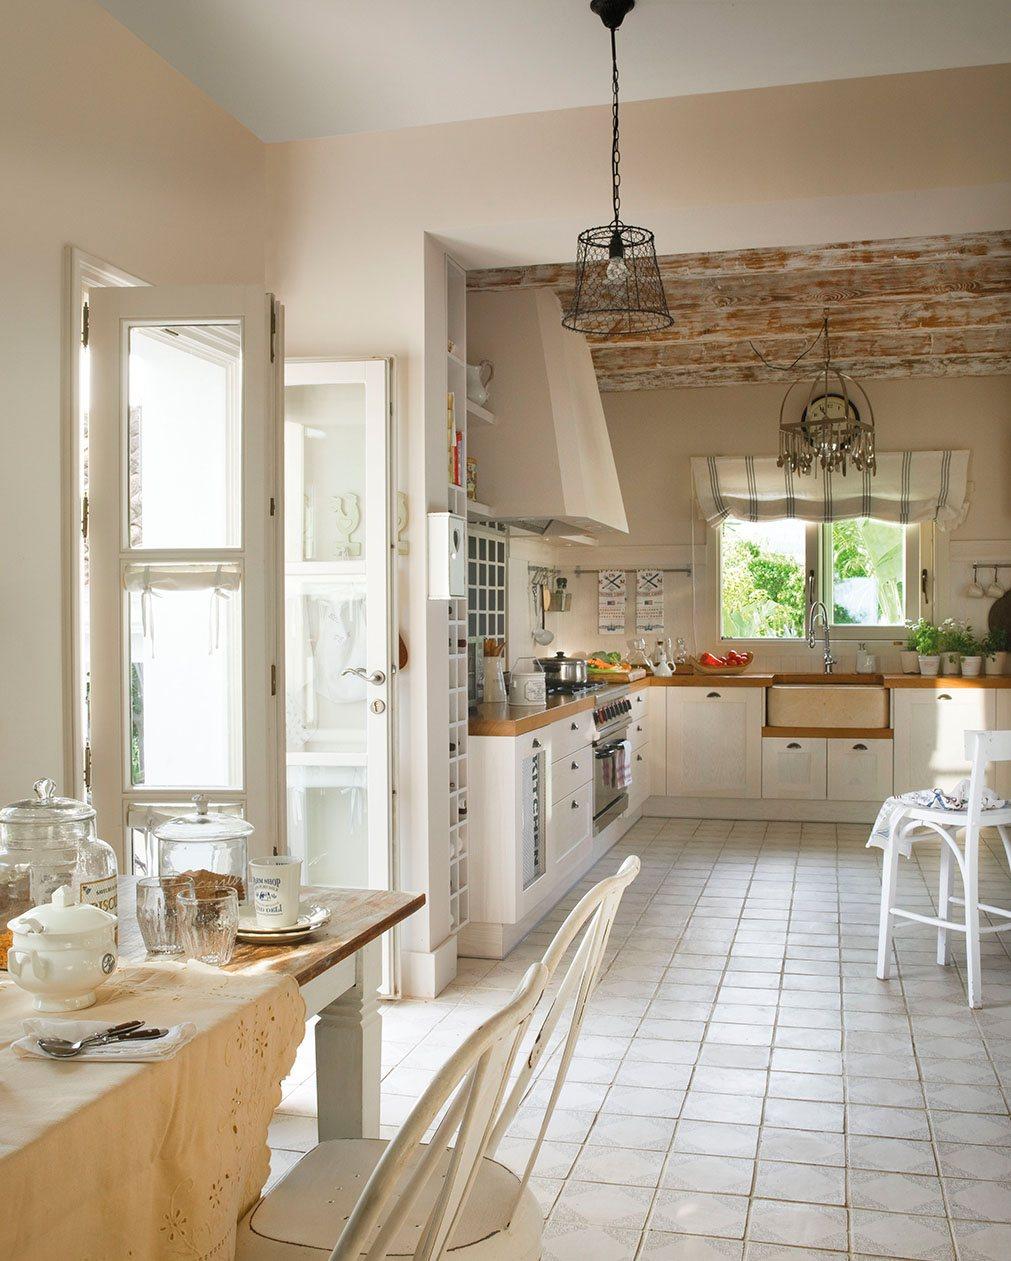 Ideas para redise ar tu cocina for Ideas para cocinas pequenas rusticas